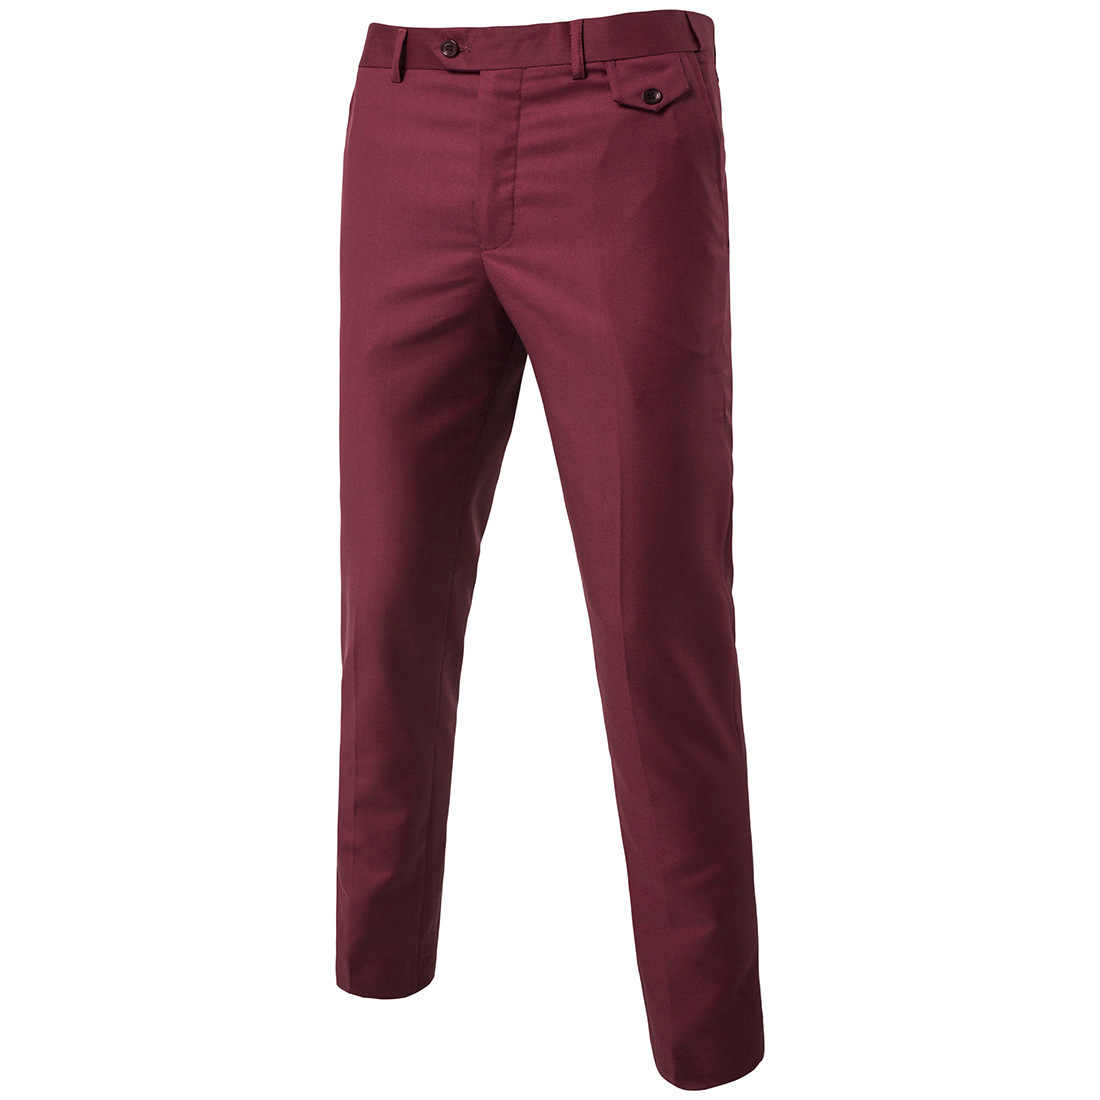 2019 Slim Fit קיץ דק מזדמן עסקי גברים פורמליות חליפת חתונת מכנסיים חתן בתוספת גודל מוצק צבע אסיה גודל מכנסיים